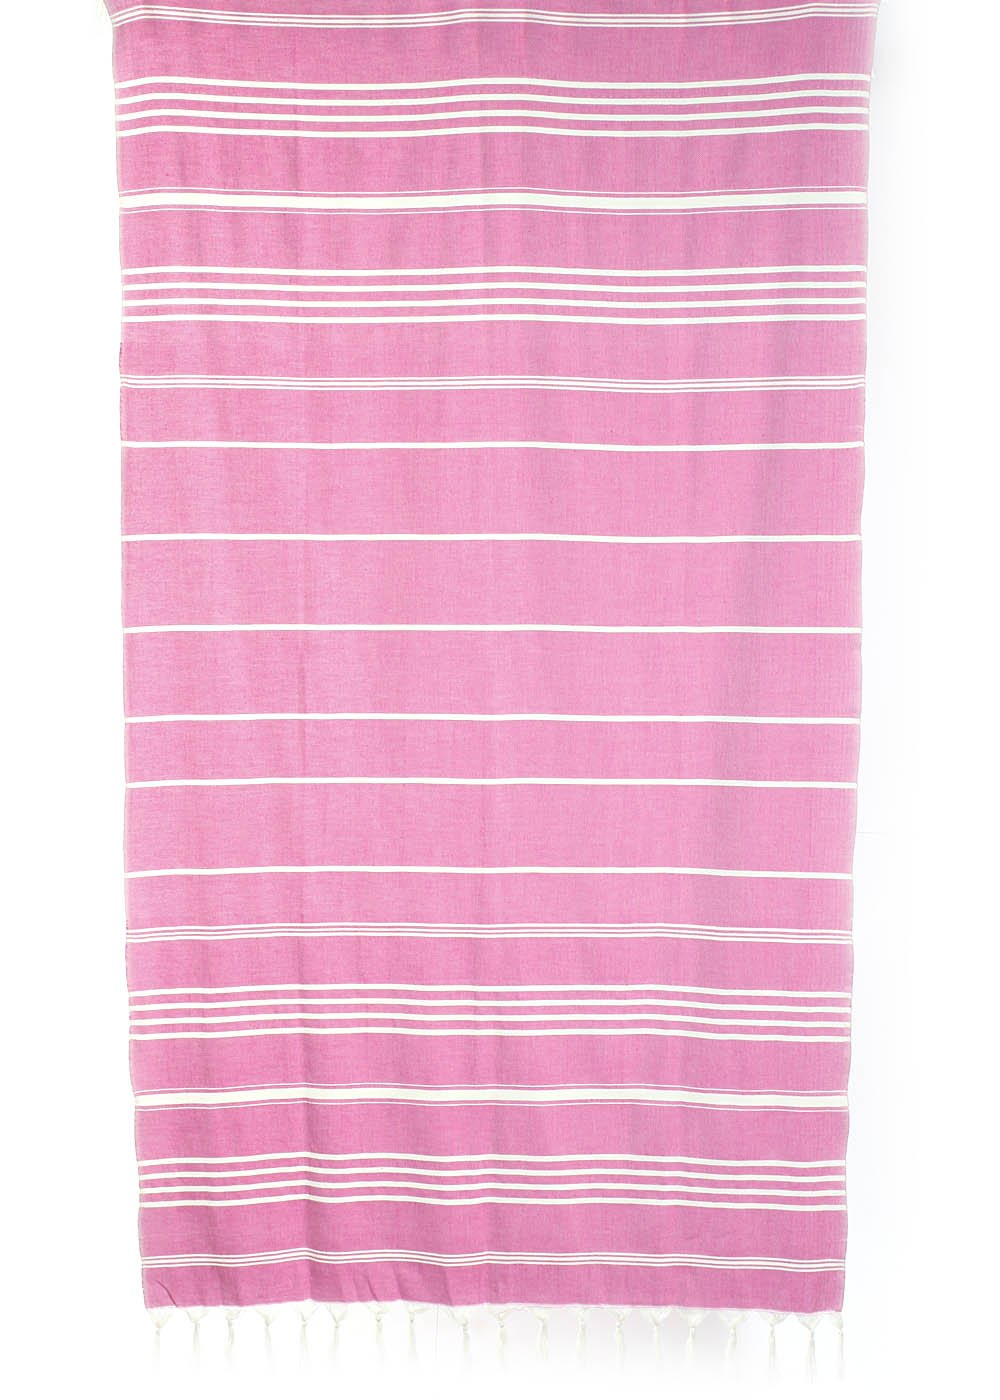 Ultra-Soft Sauna Fast-Drying Traditional Peshtemal Design for Bathrooms Beach Cacala Sultan Series Turkish Bath Towels 100/% Natural Cotton